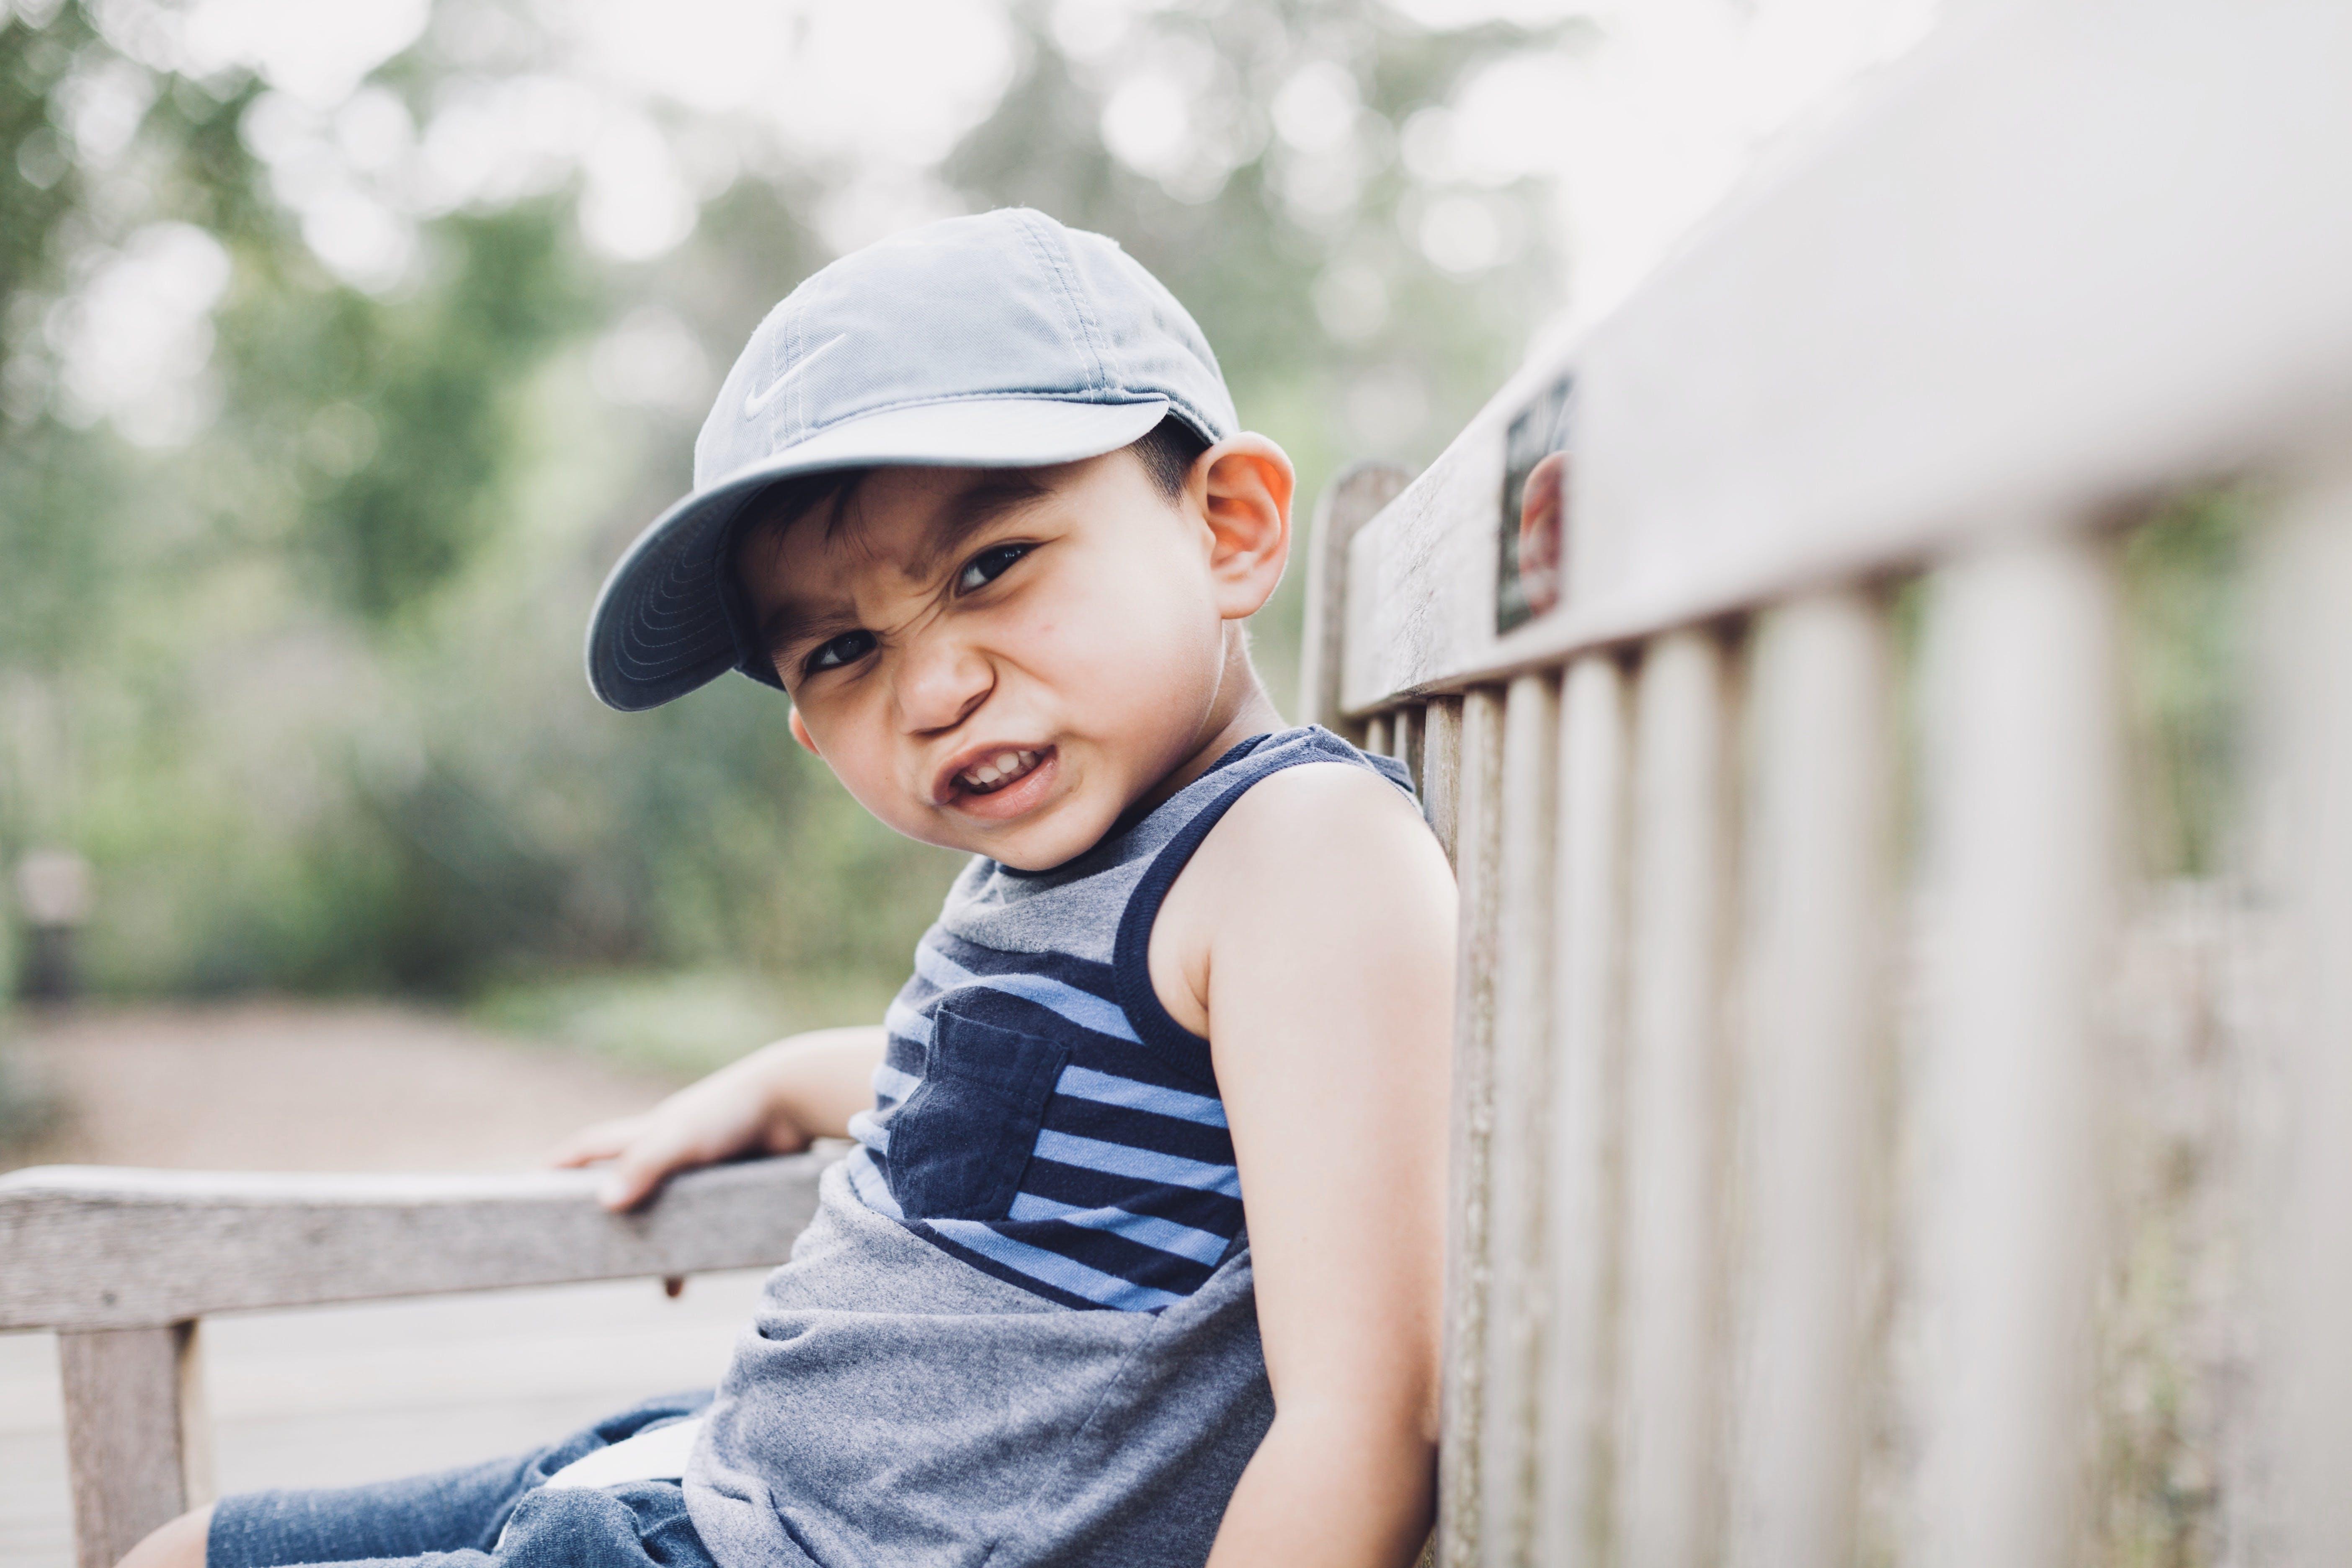 Photograph of a boy